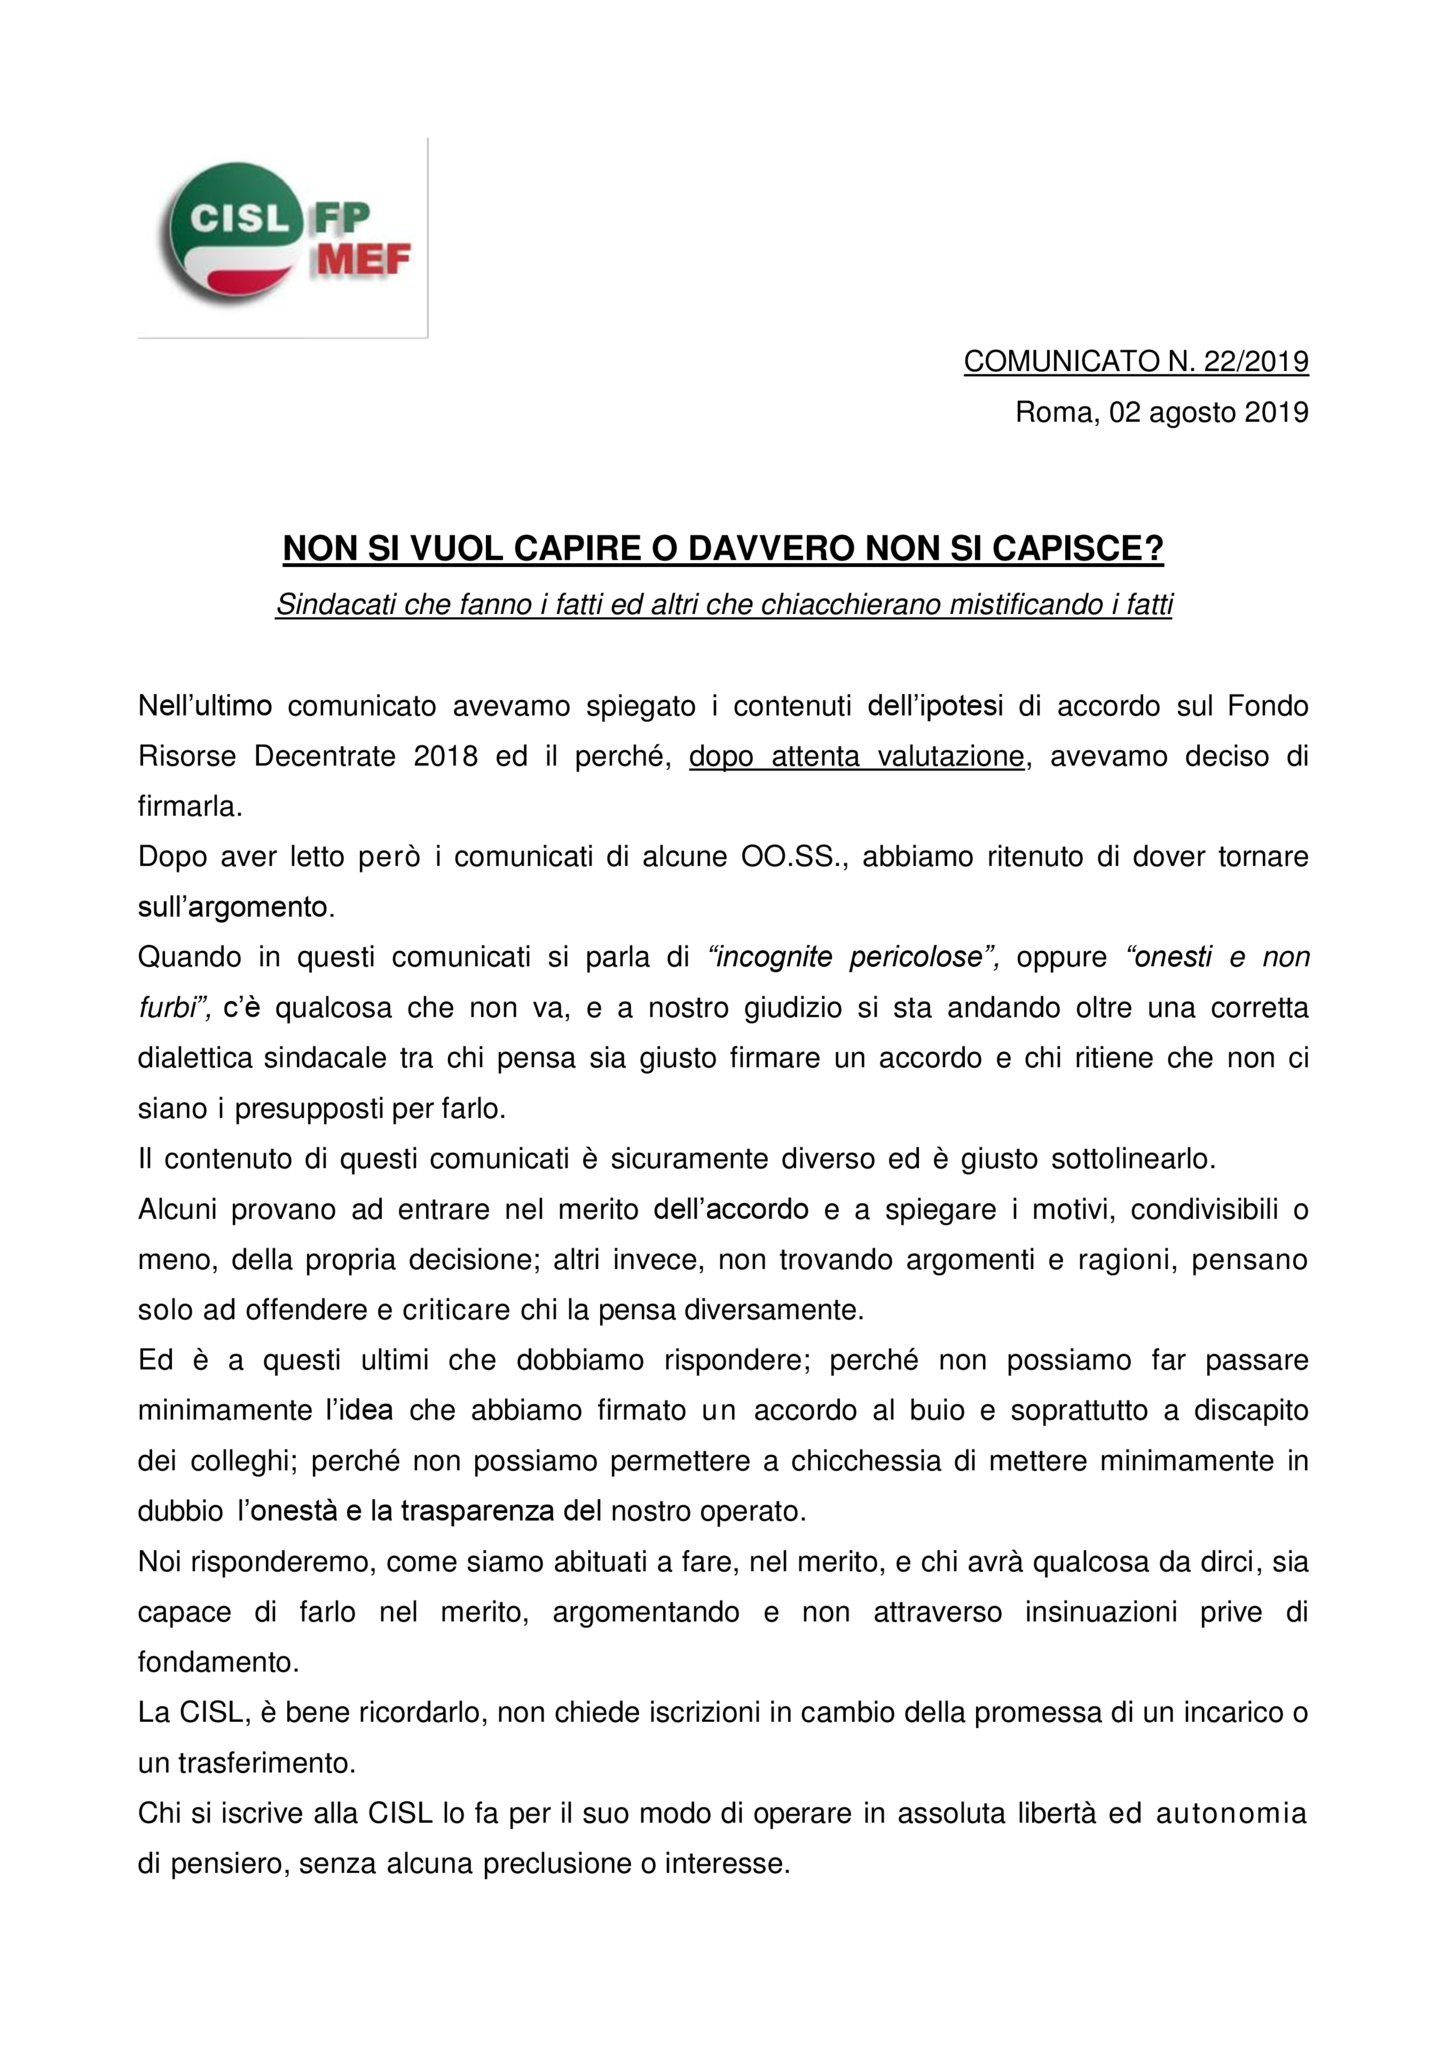 thumbnail of 22-COMUNICATO-NON-SI-VUOL-CAPIRE-O-DAVVERO-NON-SI-CAPISCE